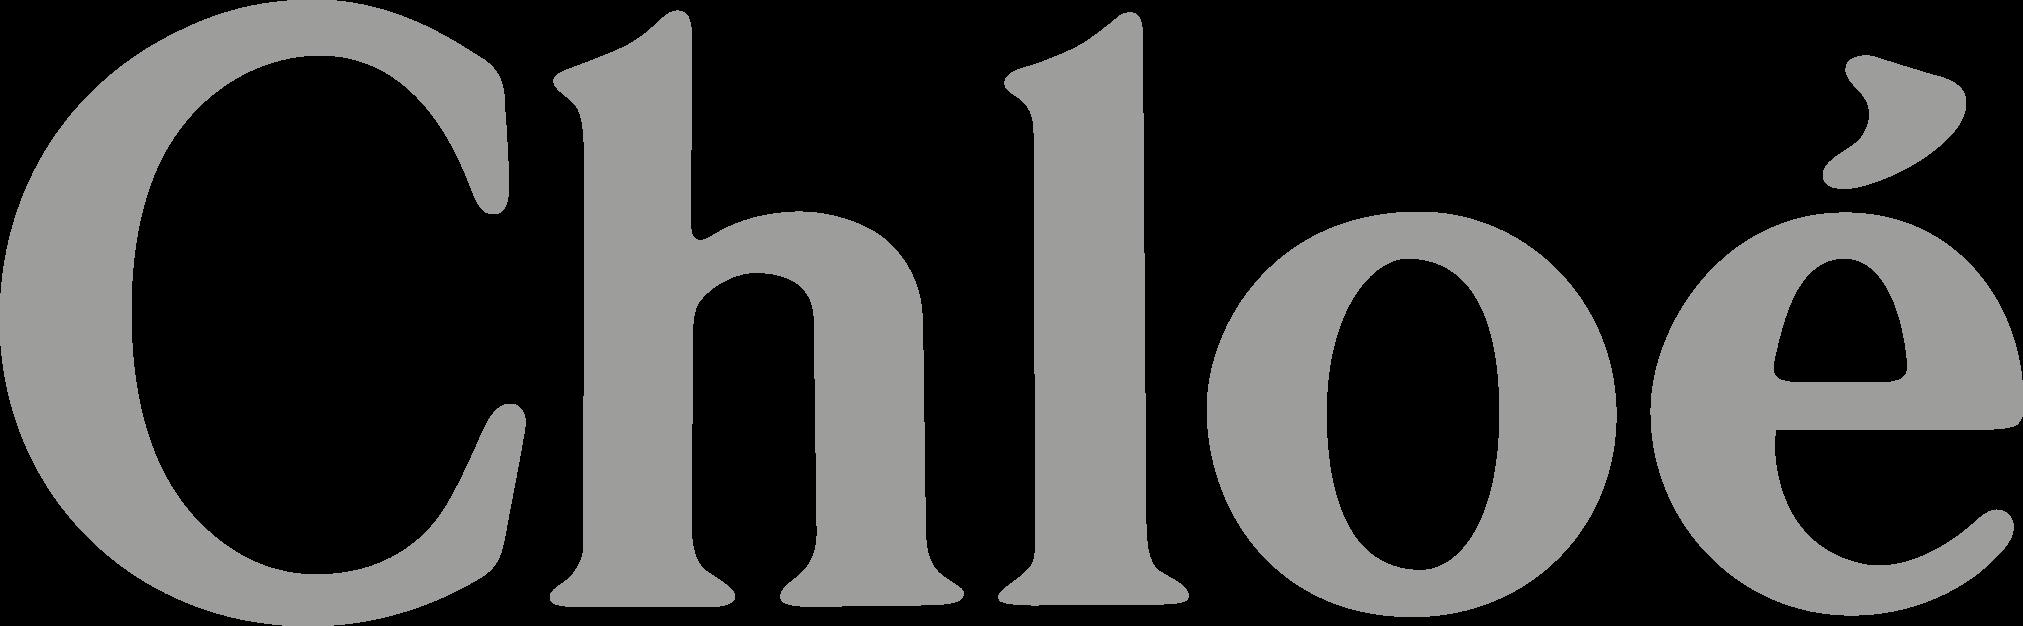 Copy of Chloé